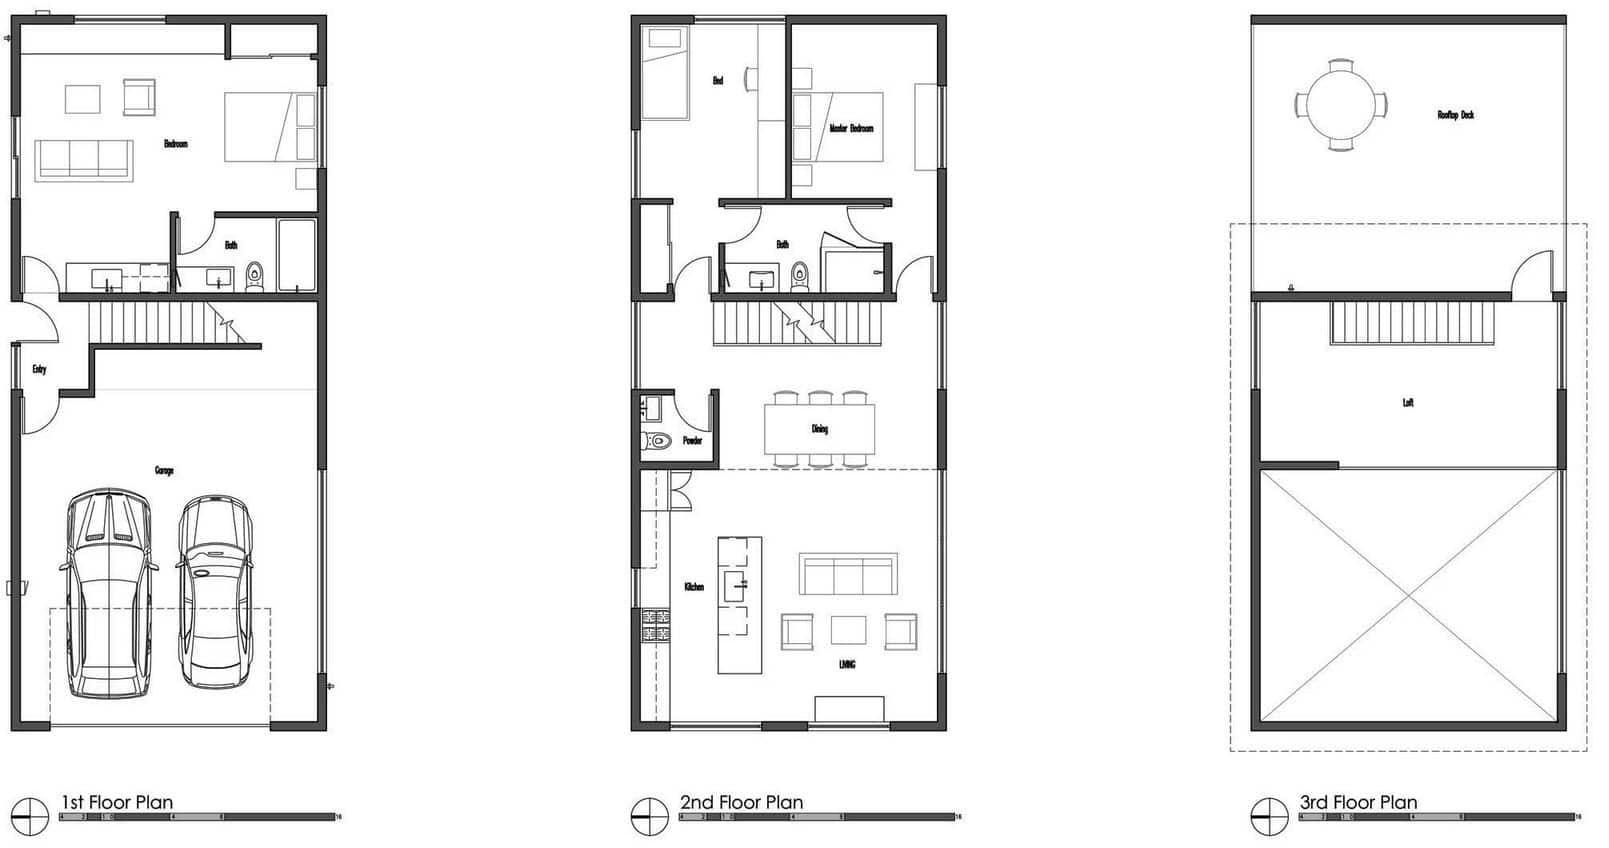 Planos de casa de dos pisos moderna for Planos de casas de 2 pisos